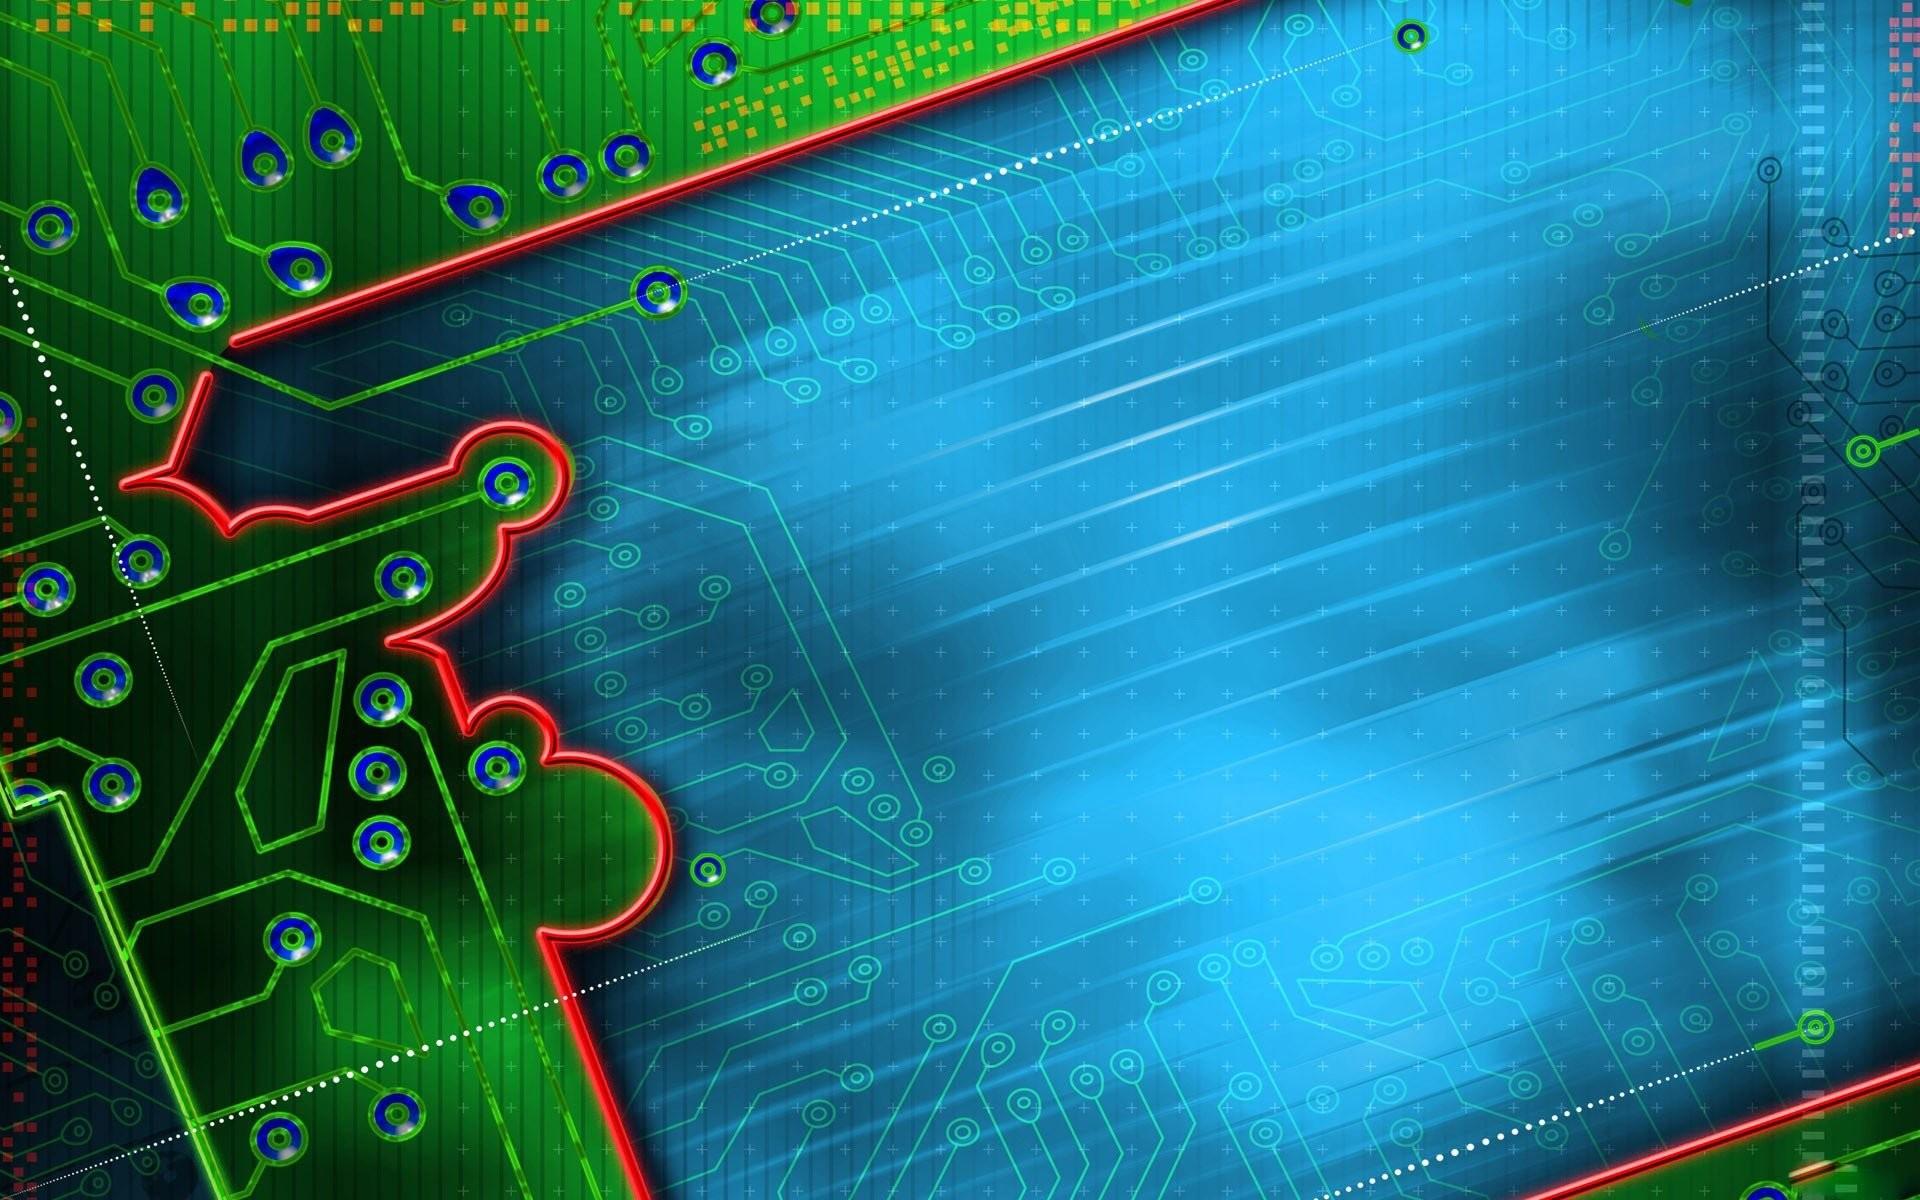 widescreen, wallpaper, electronics, green, background, wallpapers .